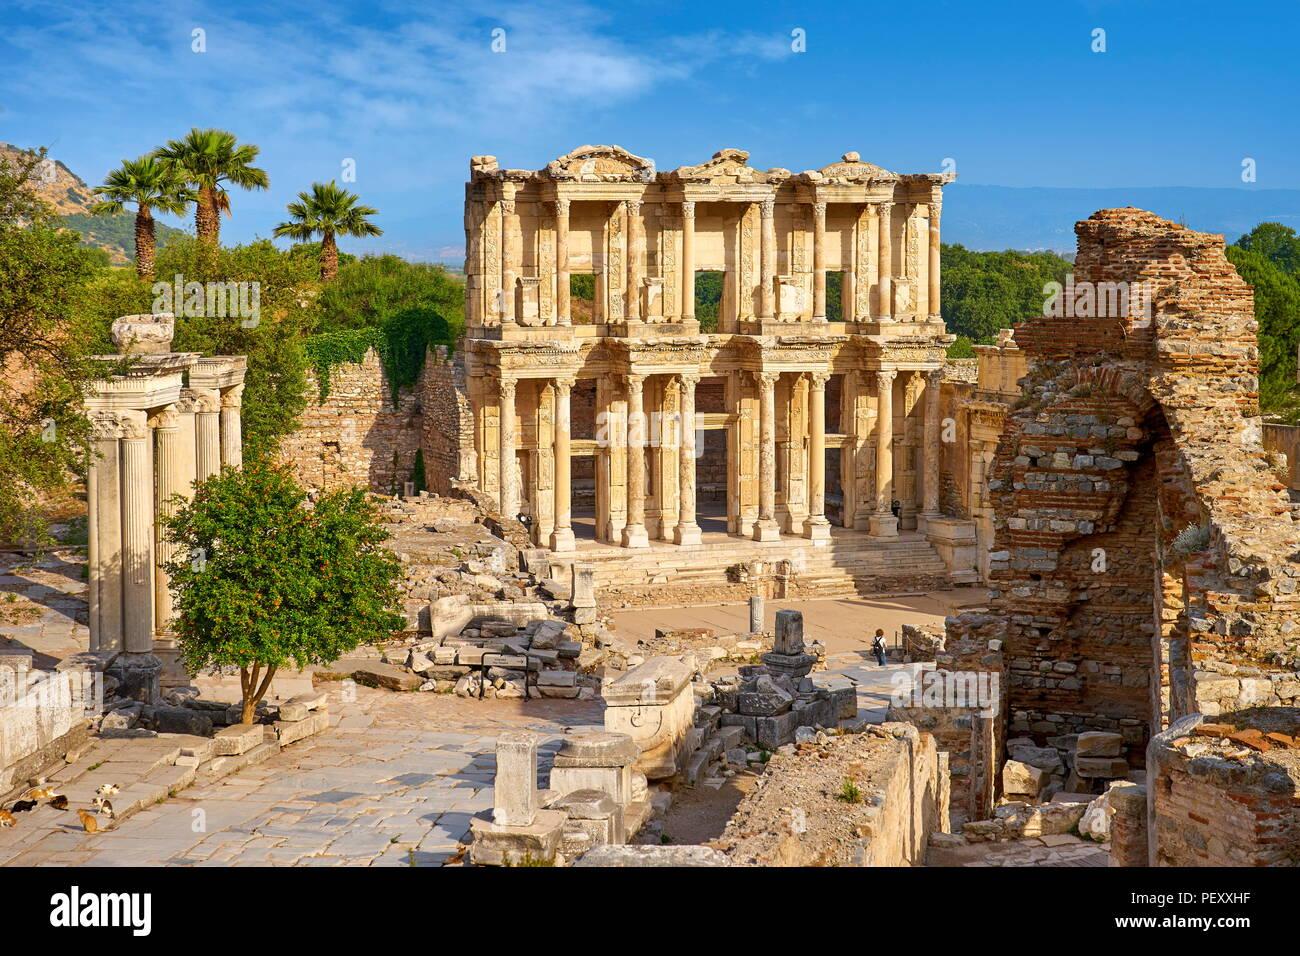 Library of Celsus, Ephesus Ancient City, Izmir, Turkey - Stock Image